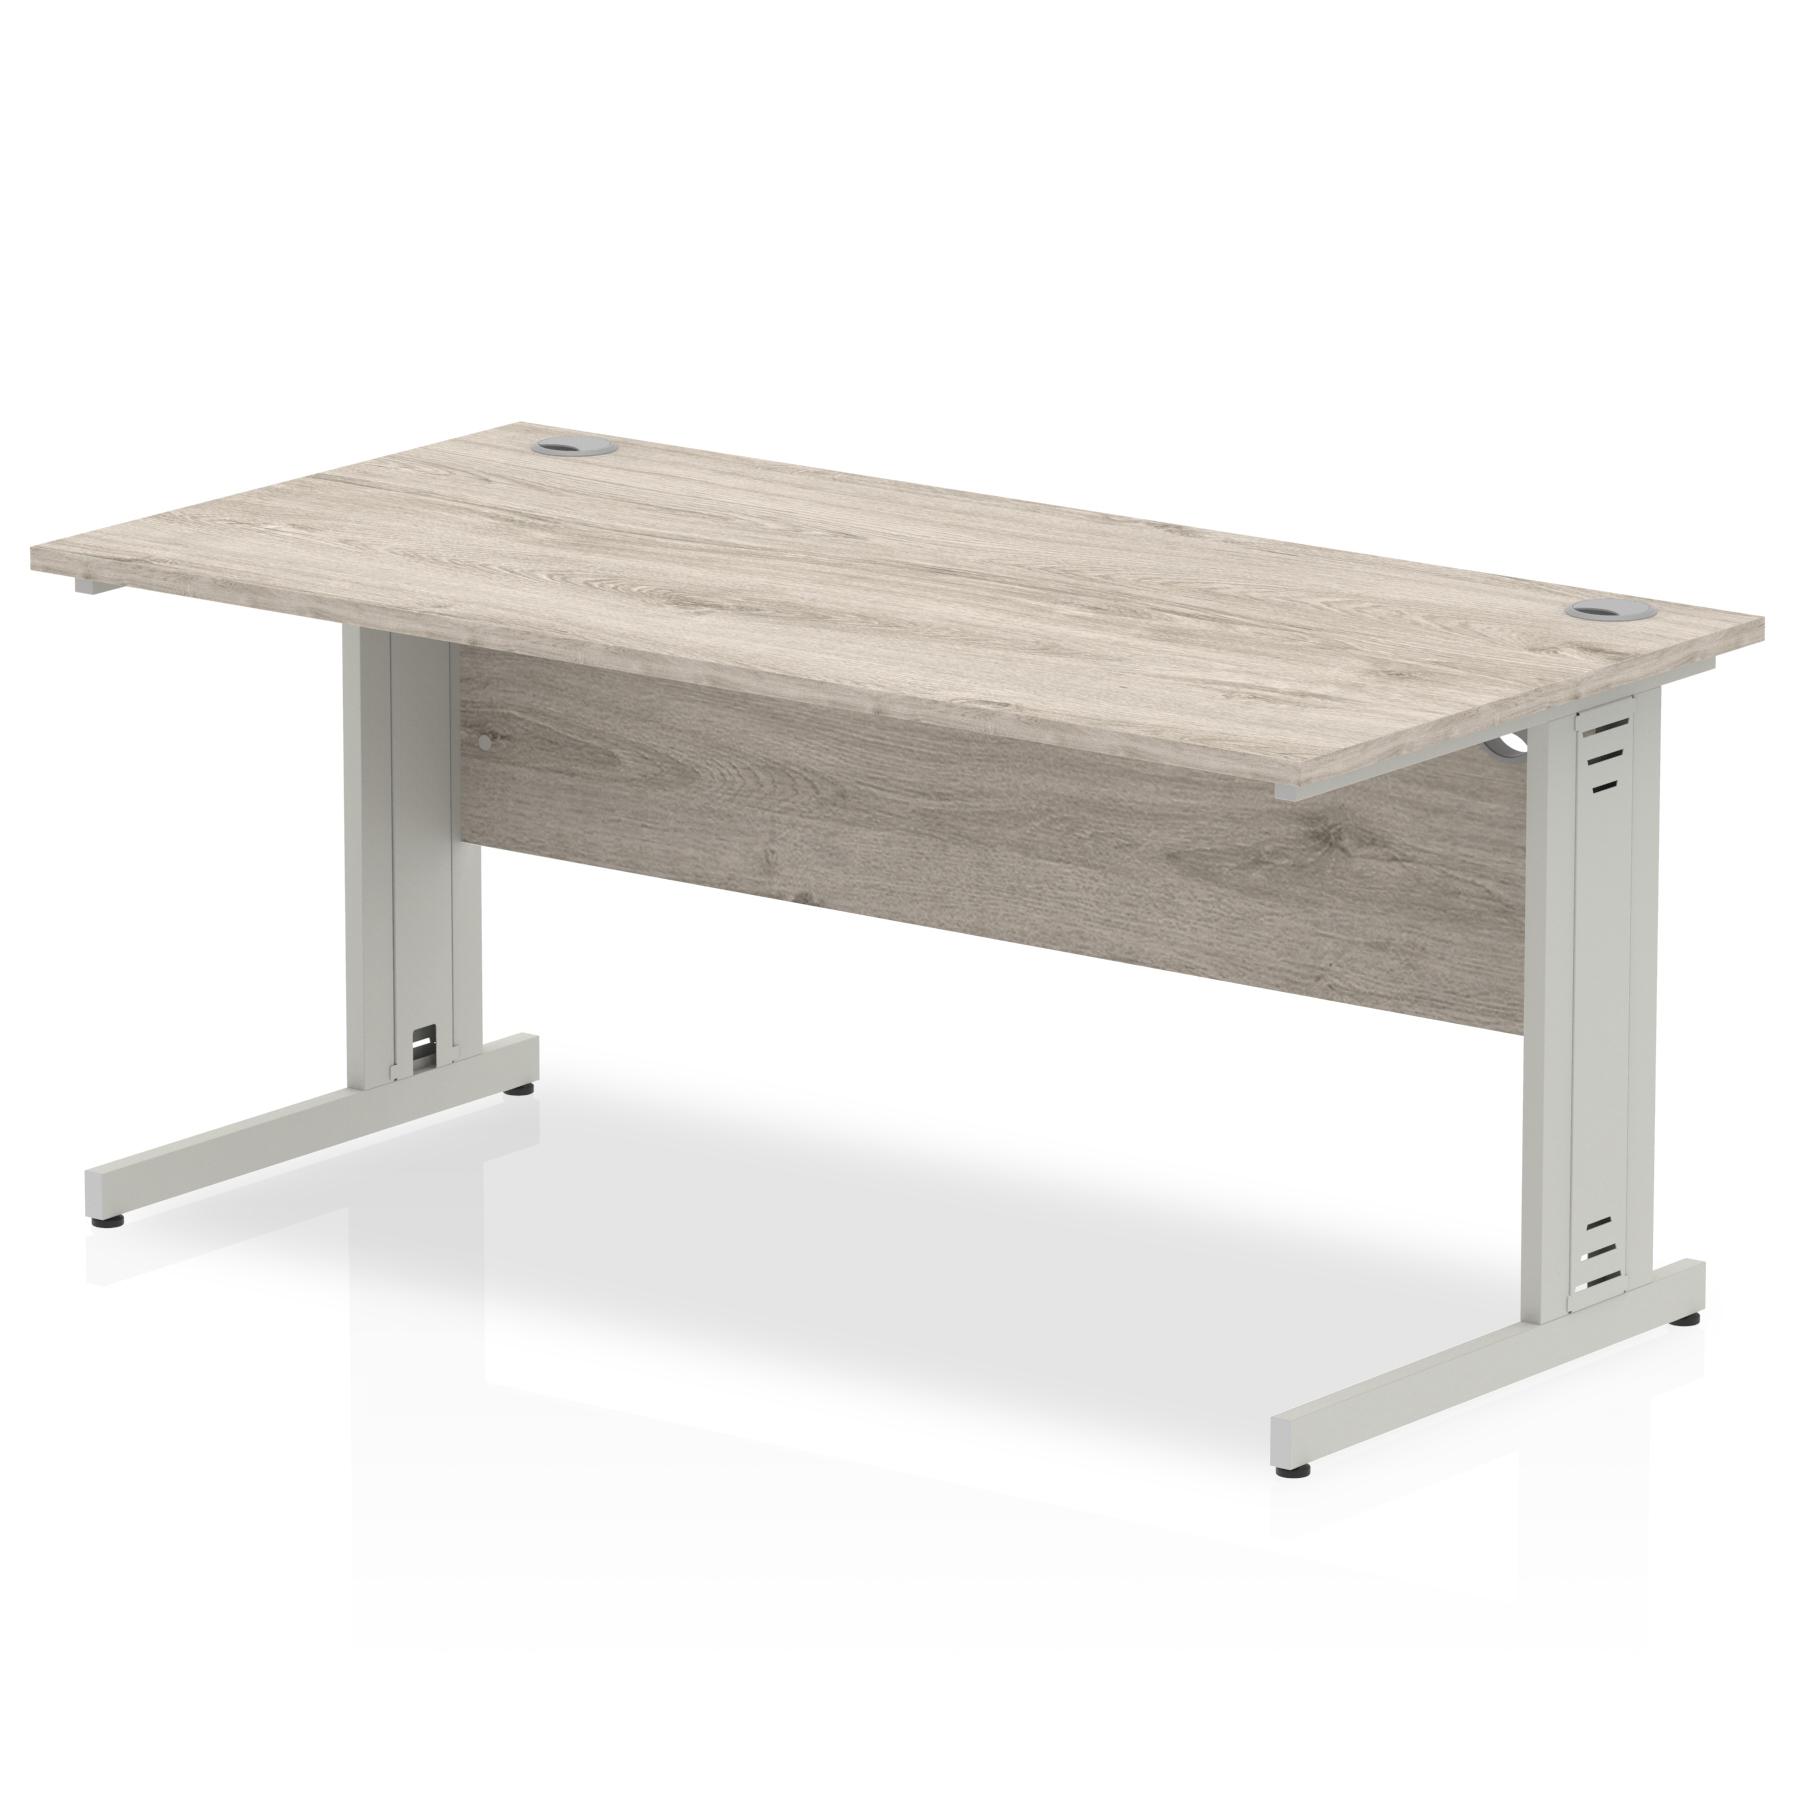 Trexus Rectangular Desk Silver Cable Managed Leg 1600x800mm Grey Oak Ref I003106